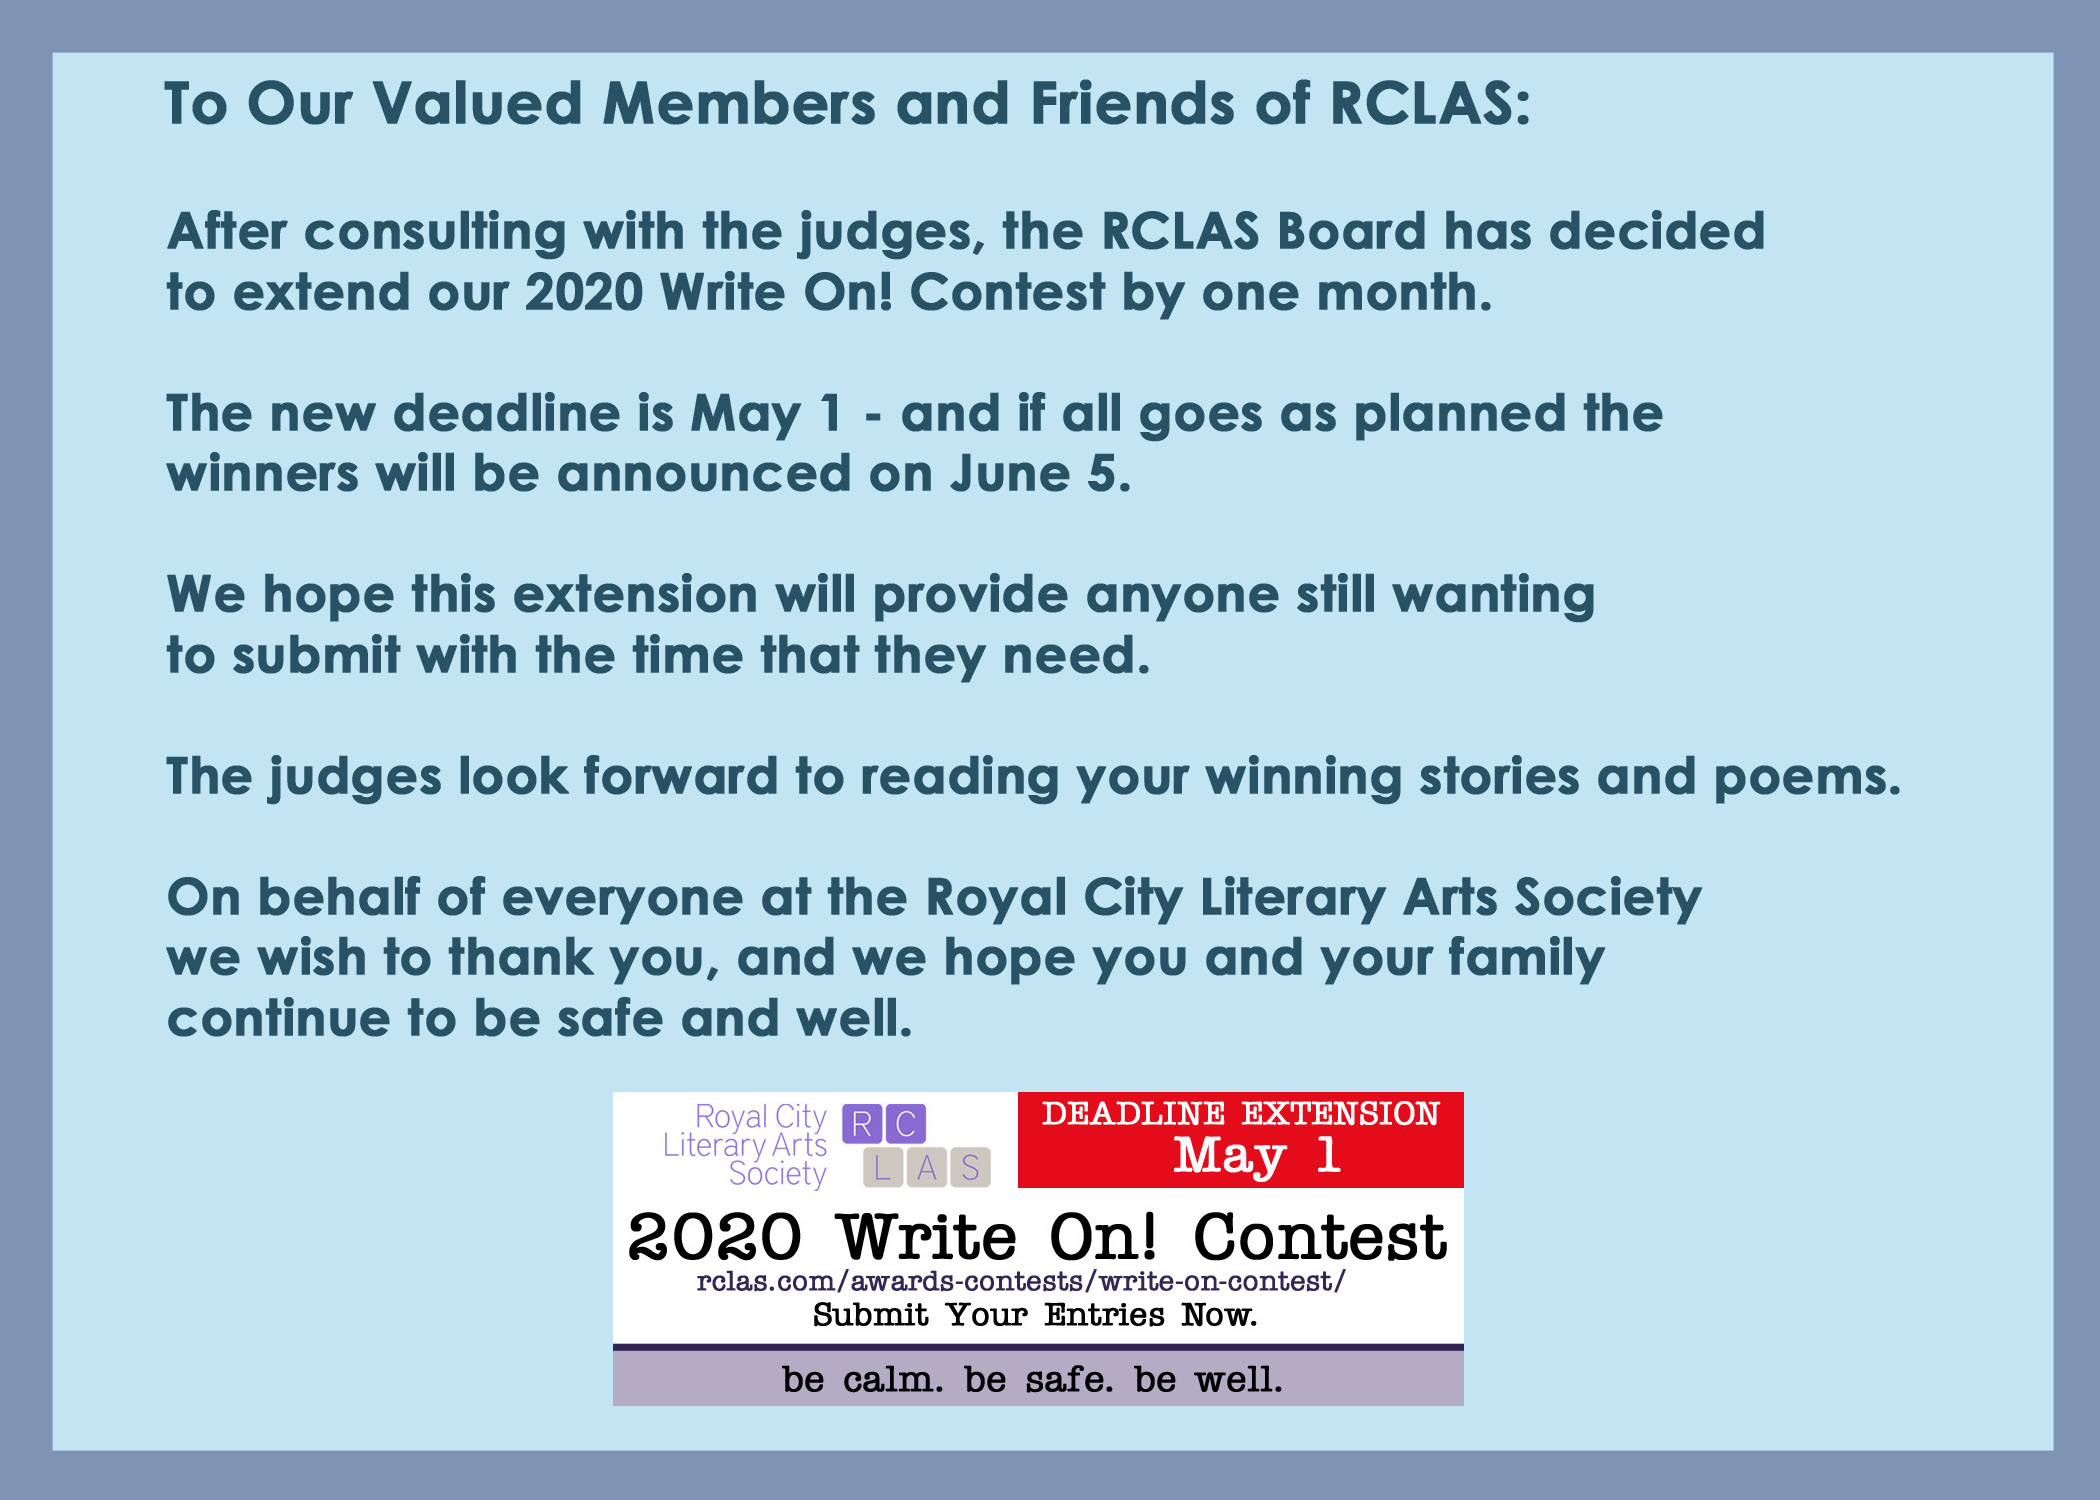 RCLAS WO Extension Note